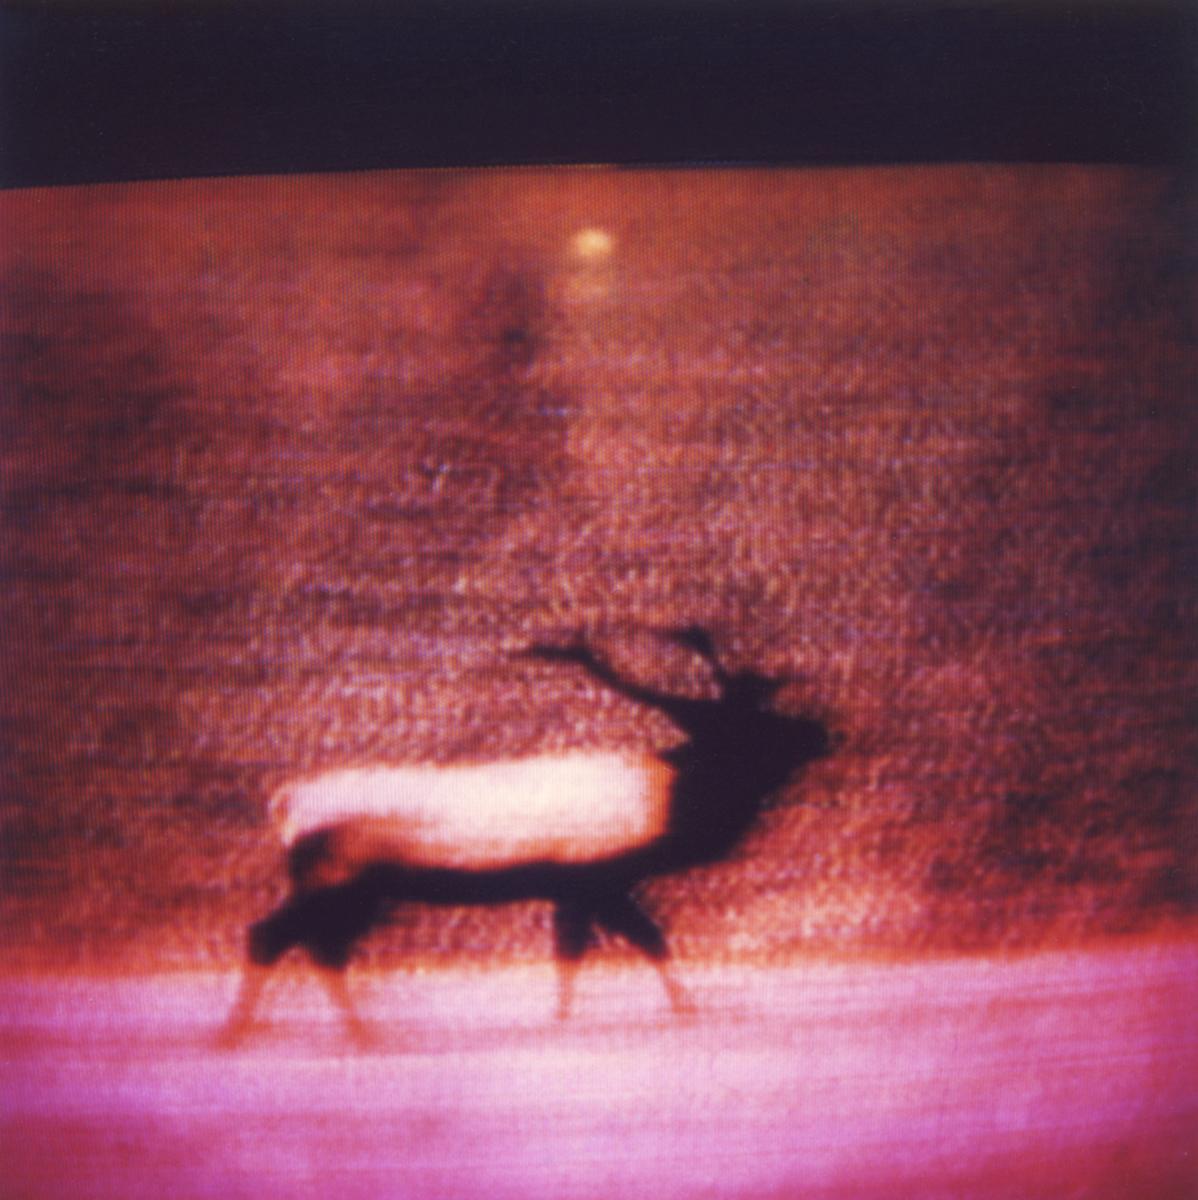 Television-TV-Polaroid-SX70-Elk-Surreal.jpg